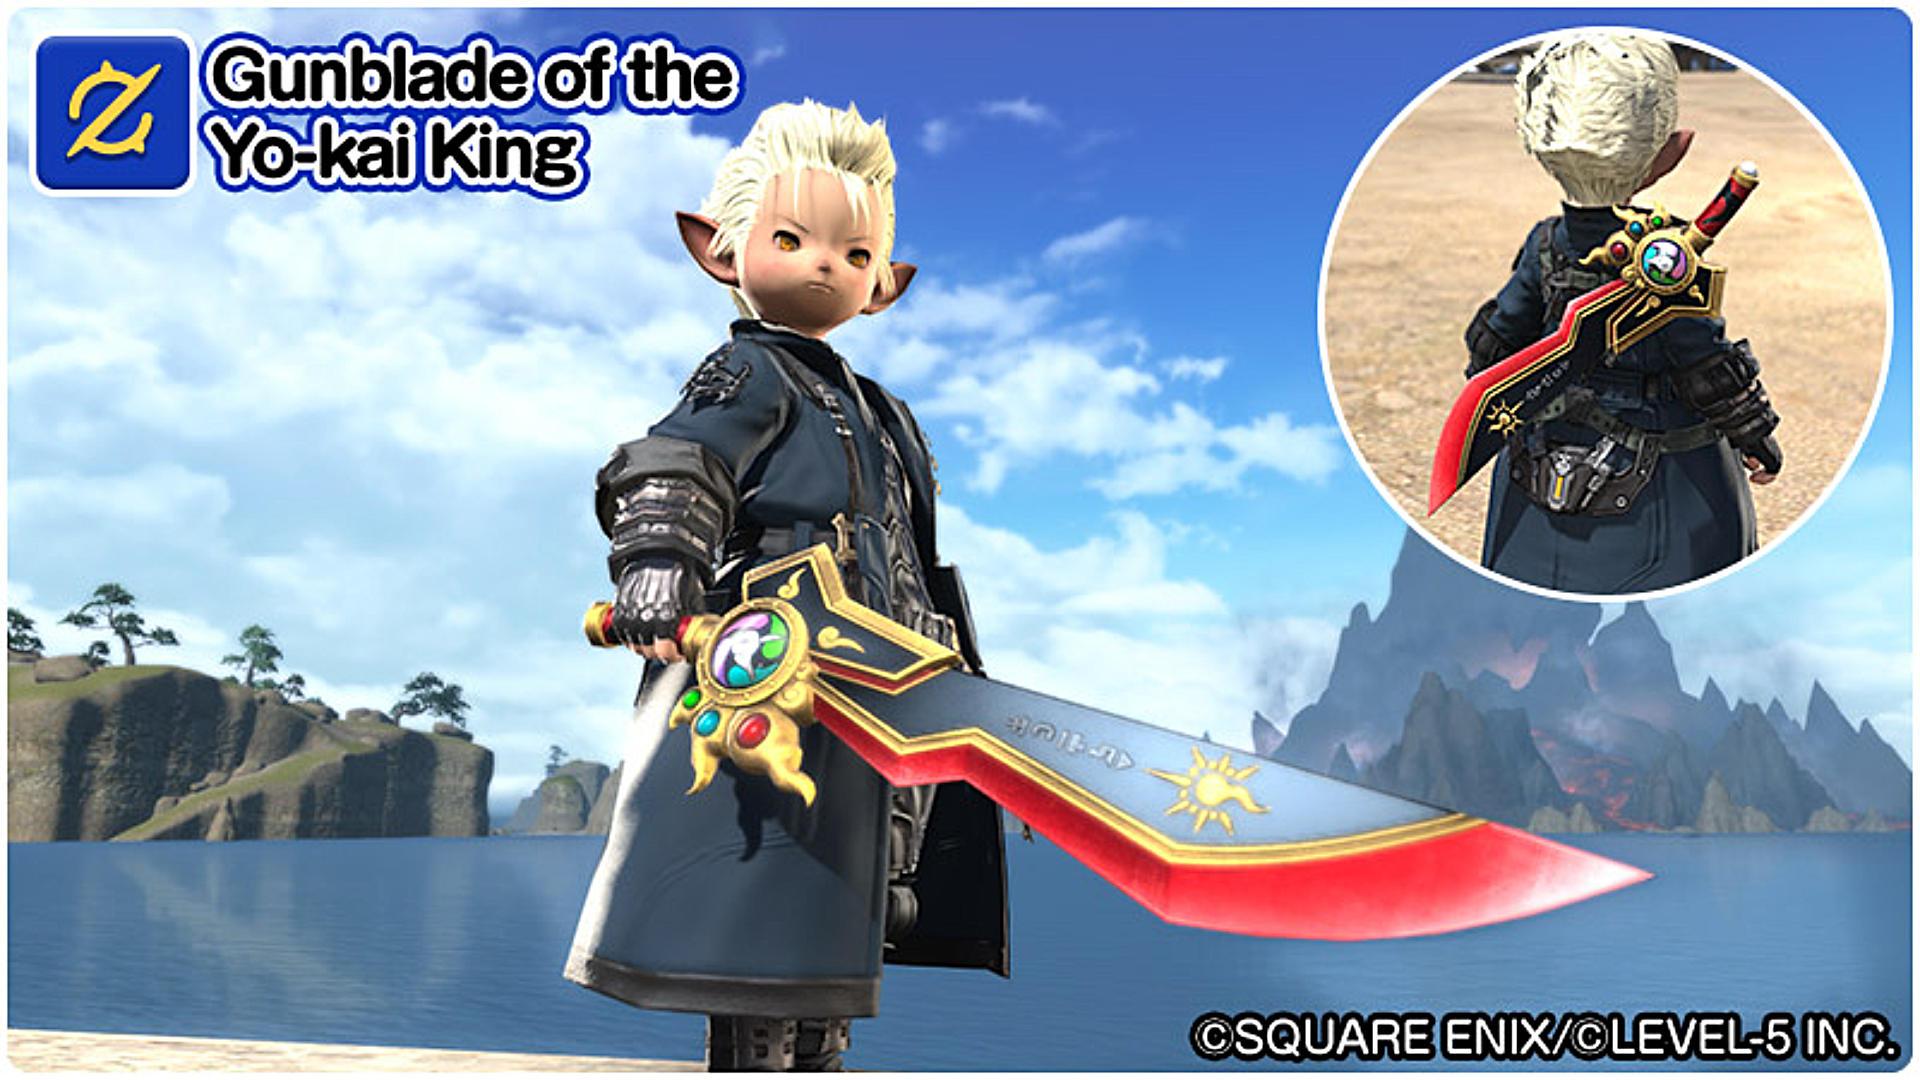 Final Fantasy XIV Gunblade of the Yo-kai King